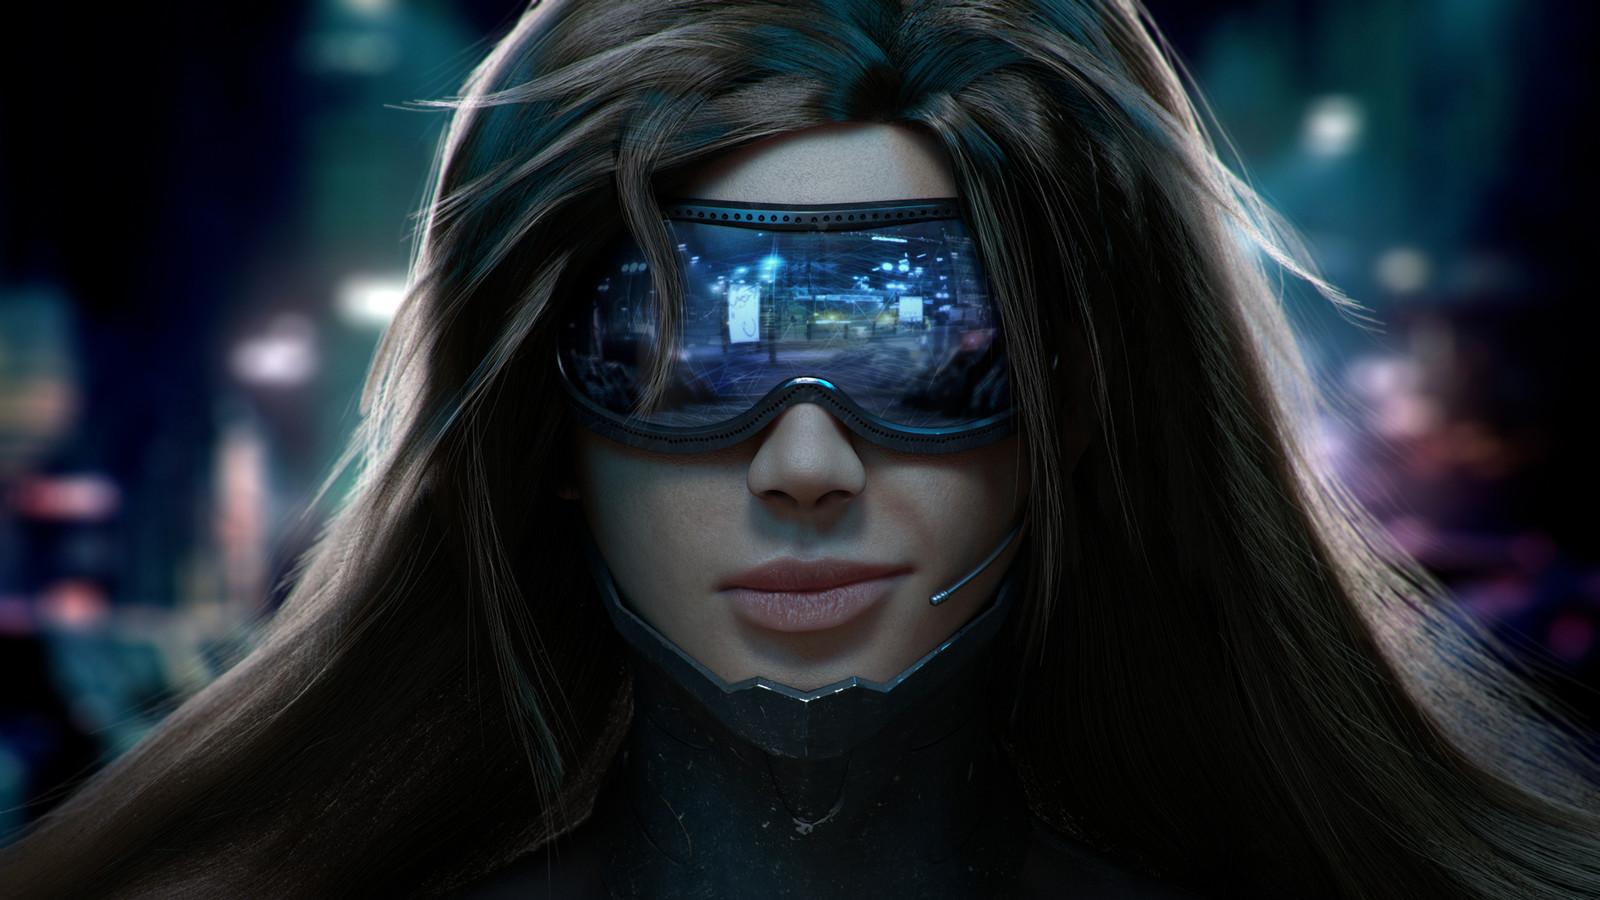 Cyber Girl 2013